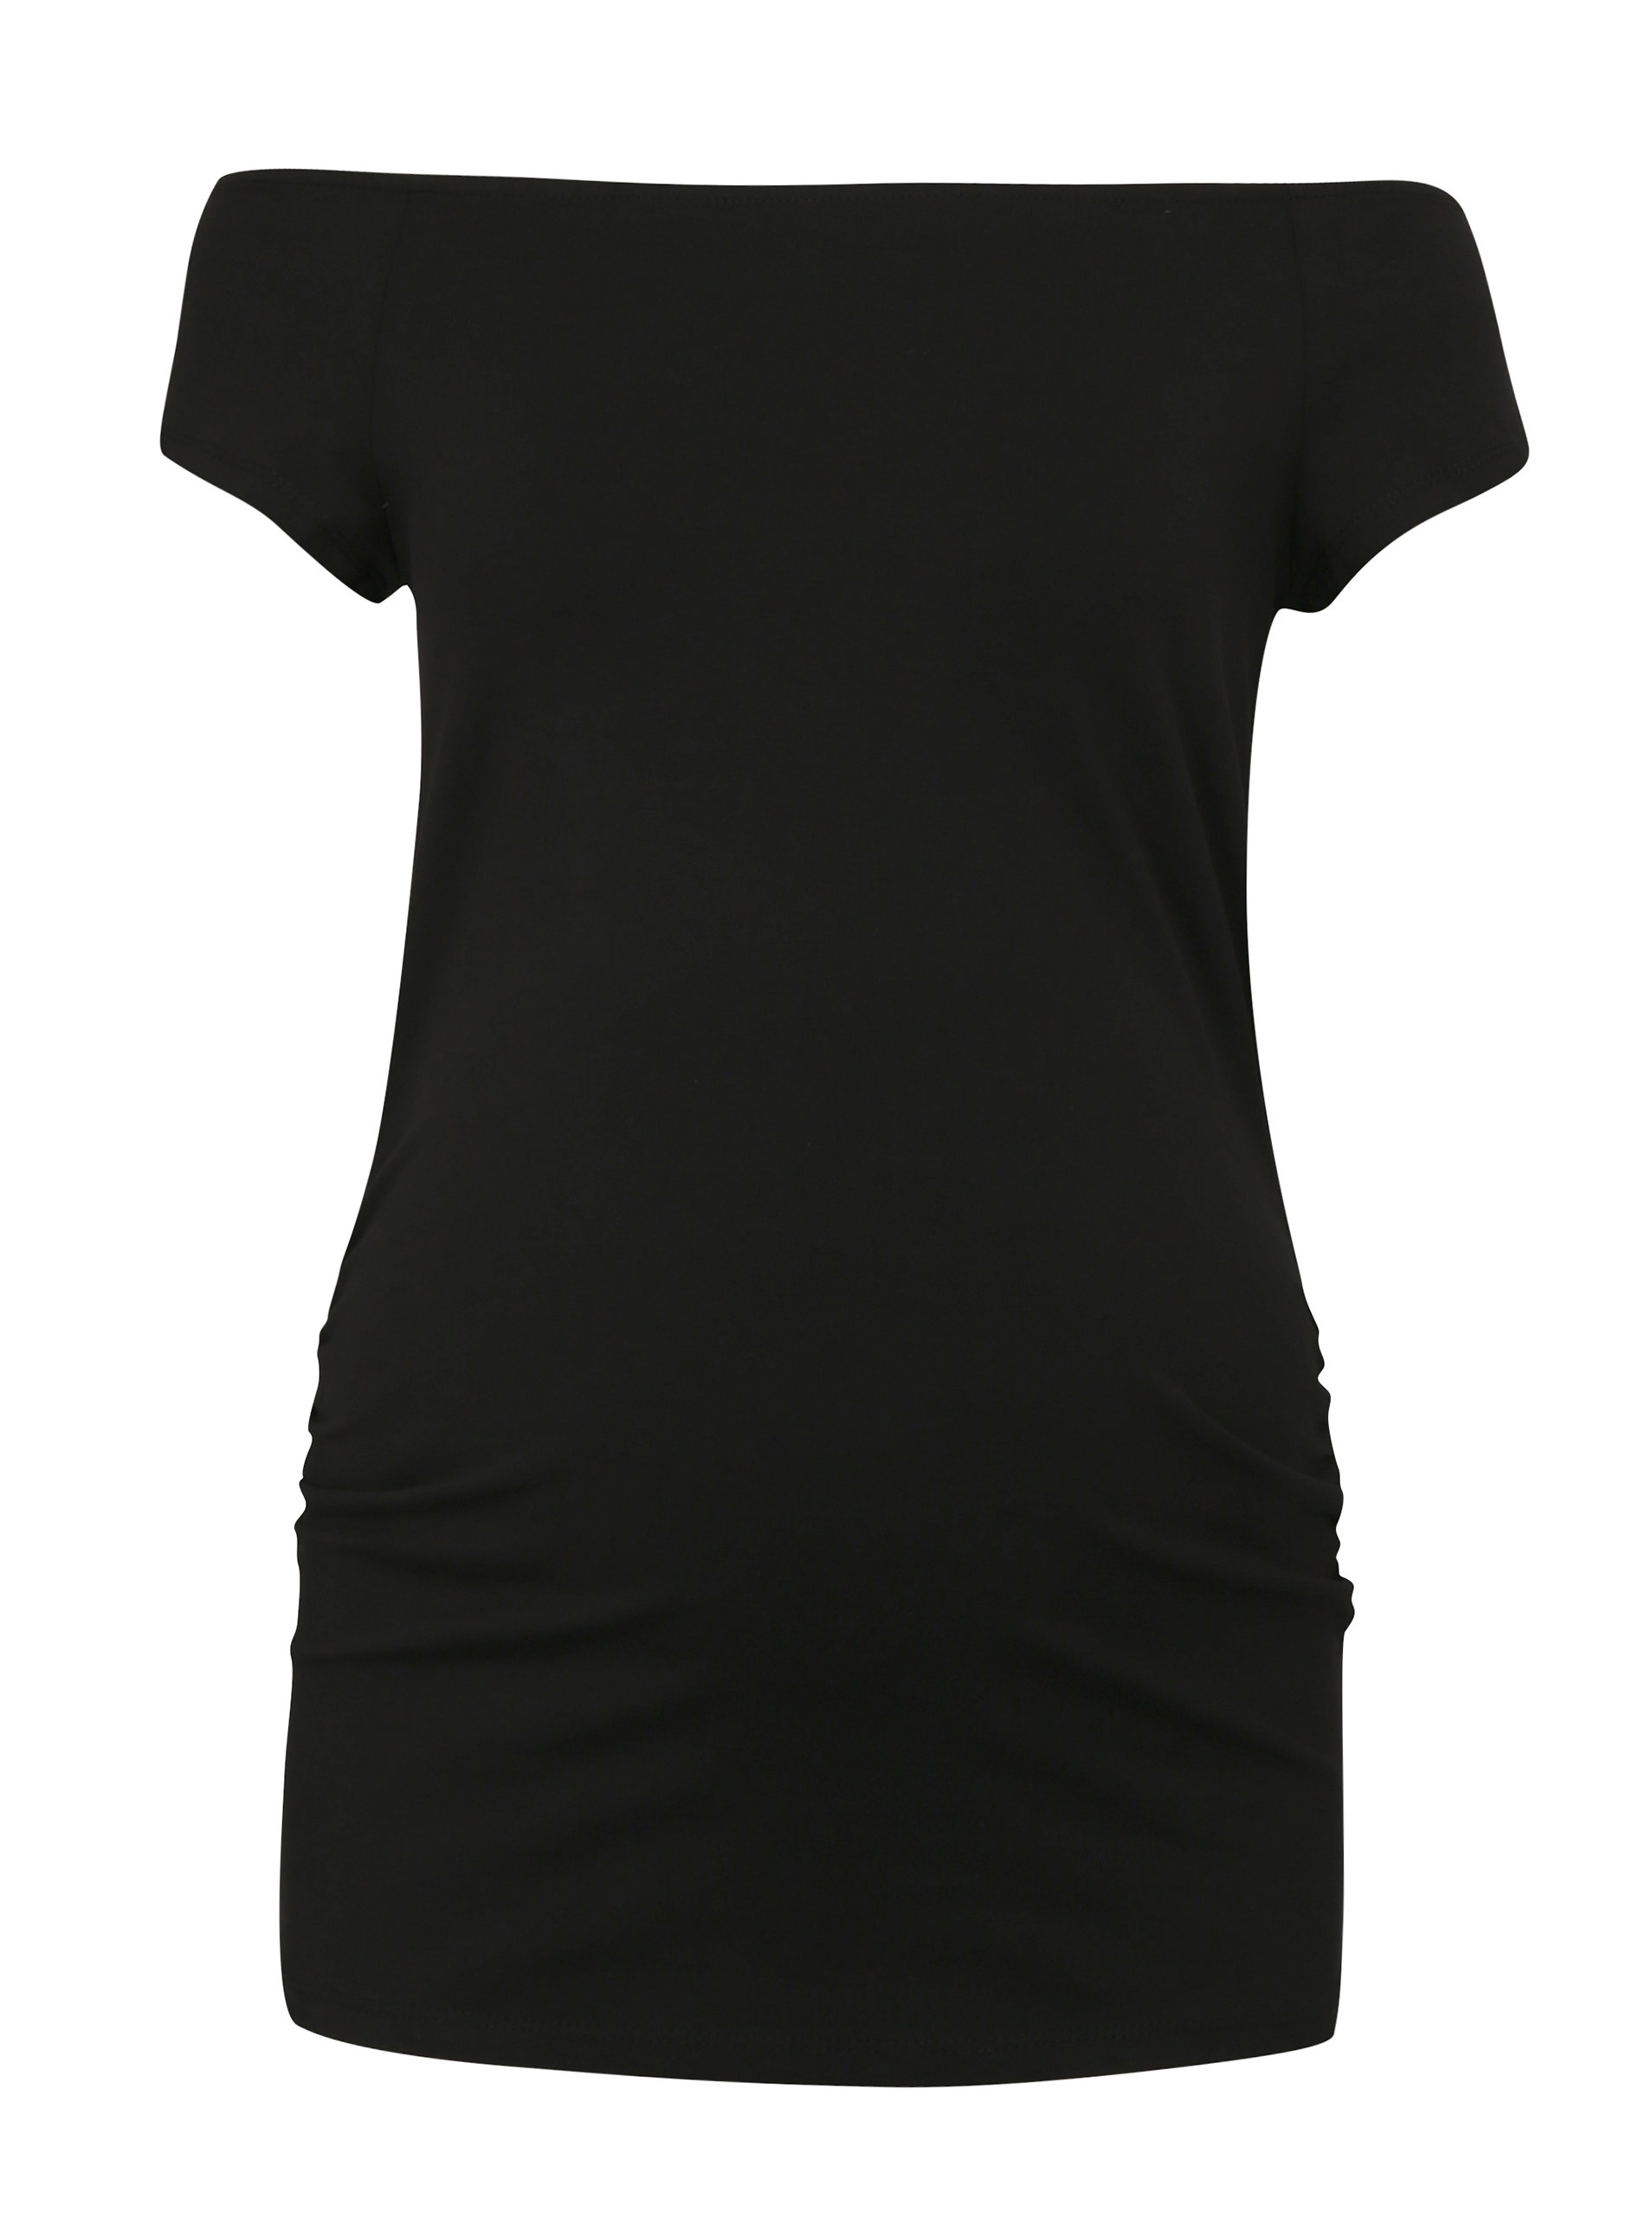 c7d84d91200c Čierne tehotenské tričko s odhalenými ramenami Dorothy Perkins Maternity ...